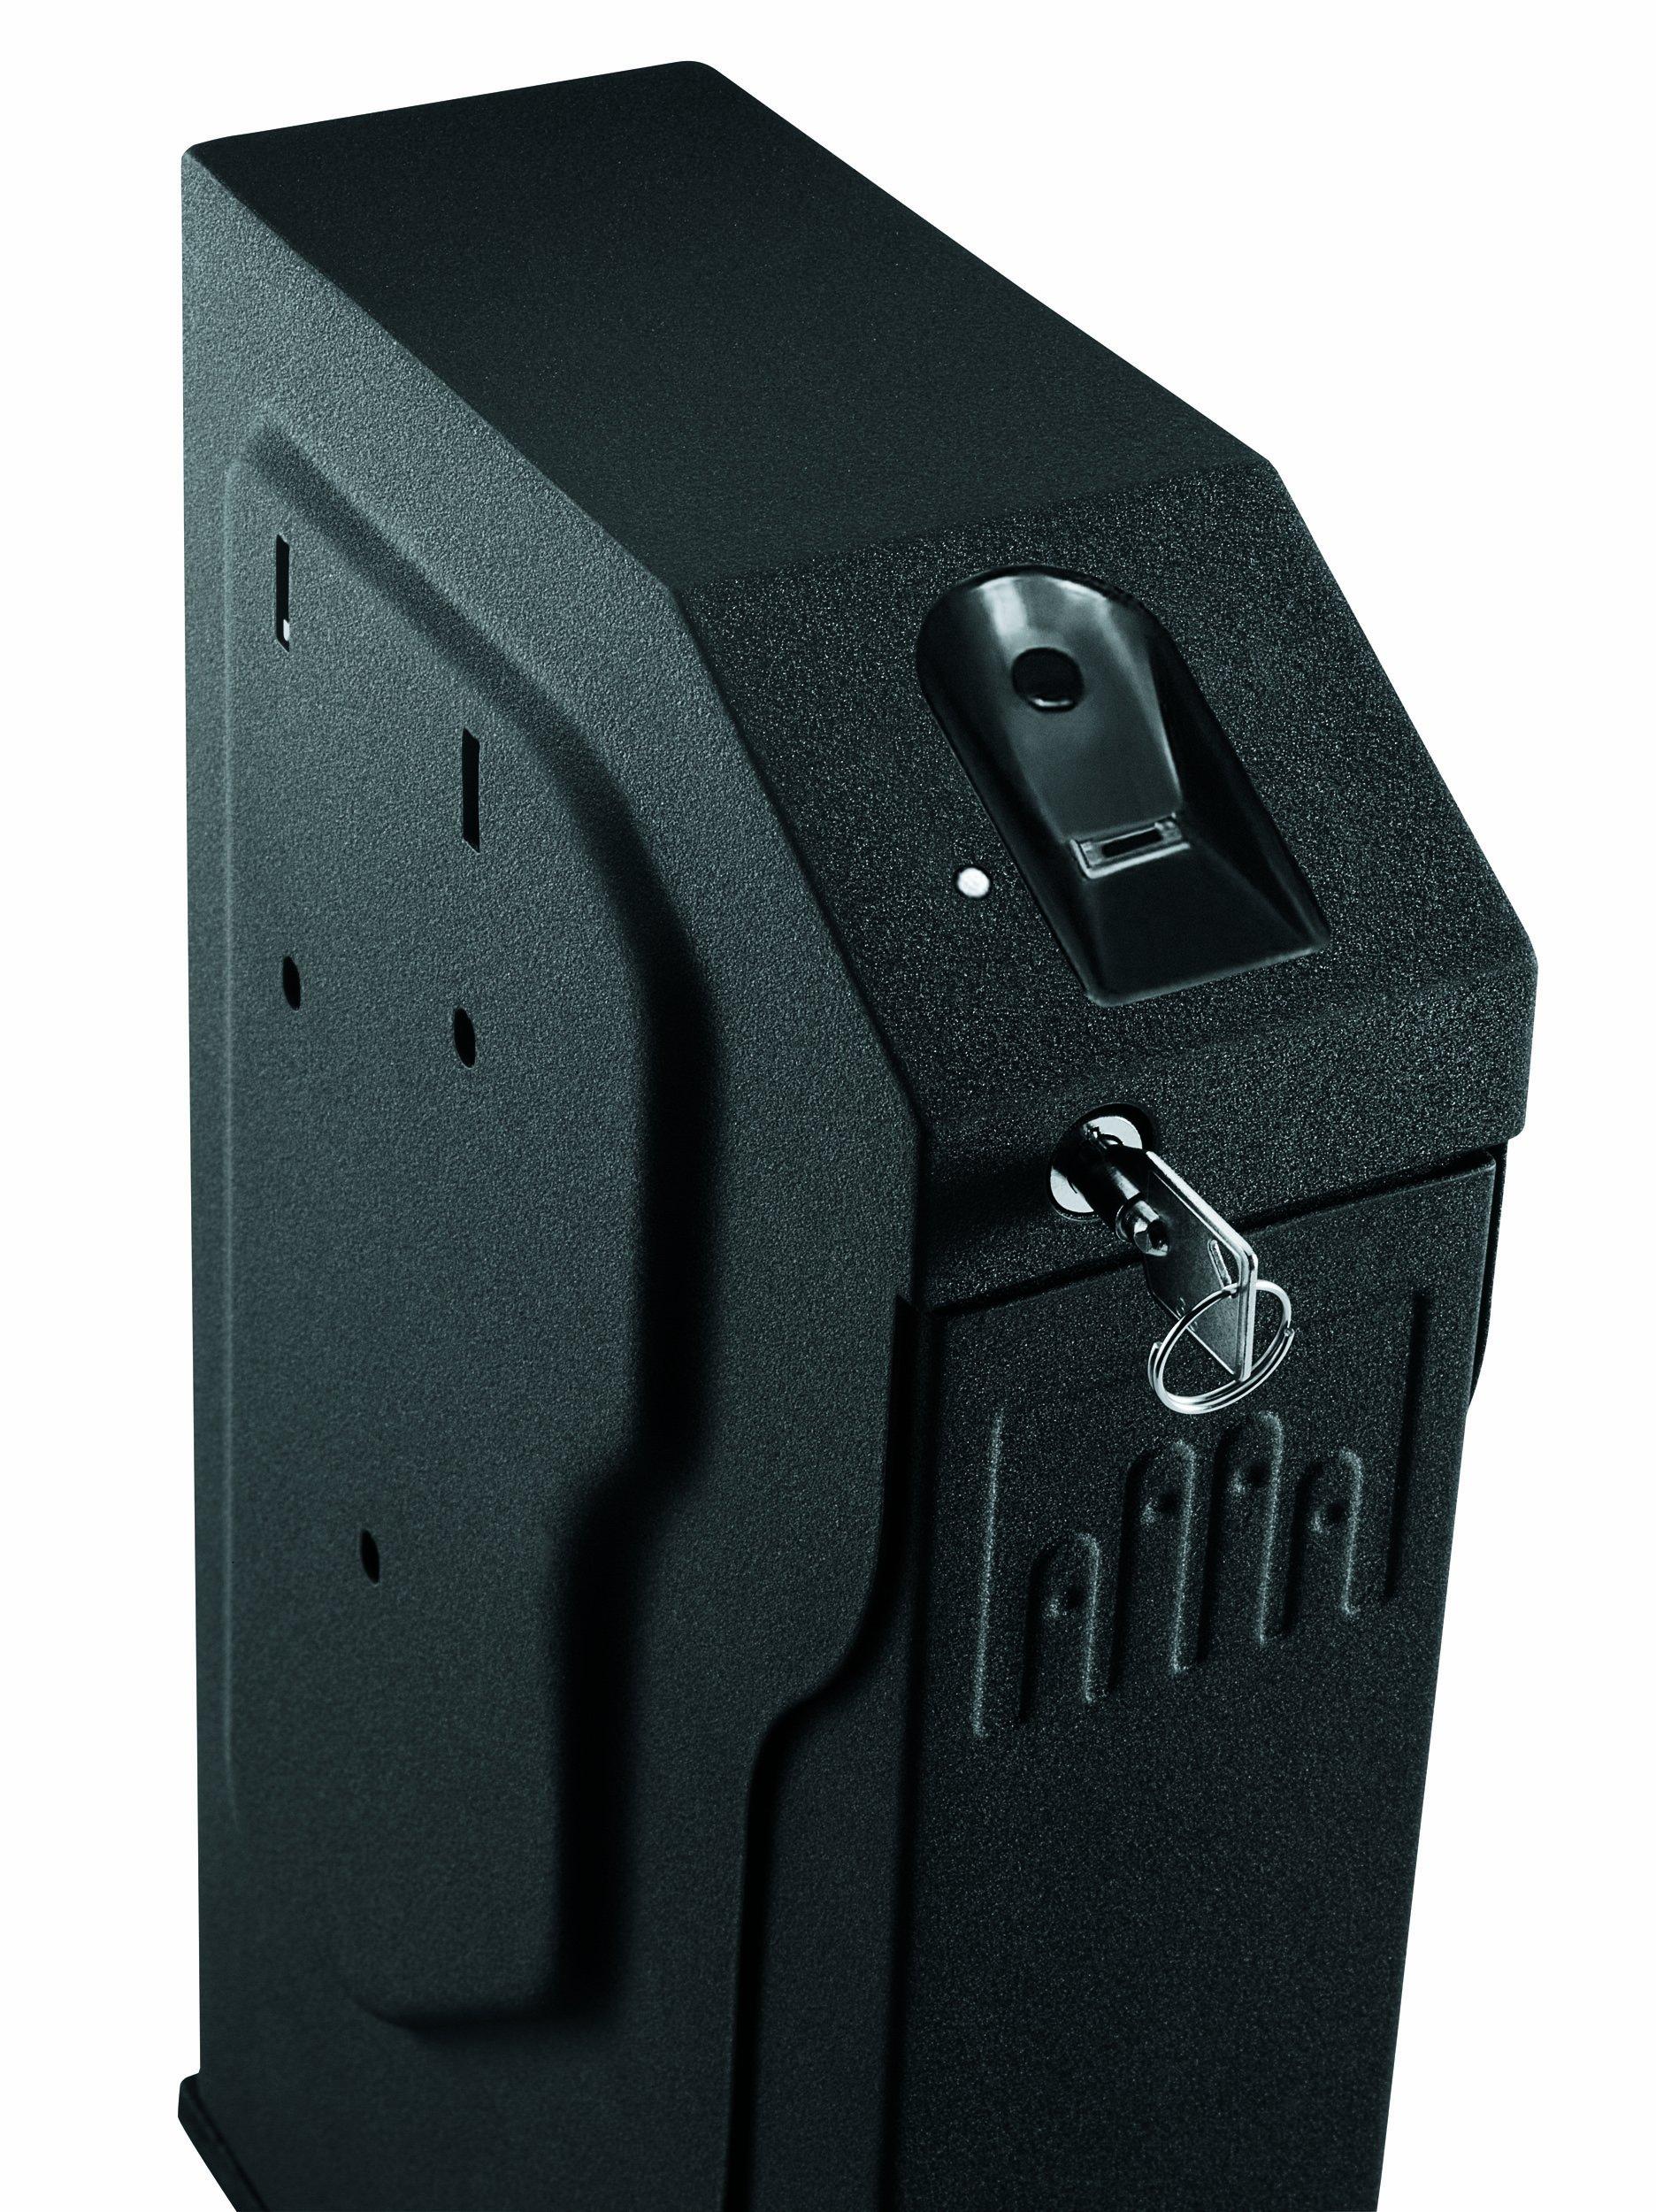 GunVault Speedvault Biometric Pistol Safe SVB500 by GunVault (Image #3)